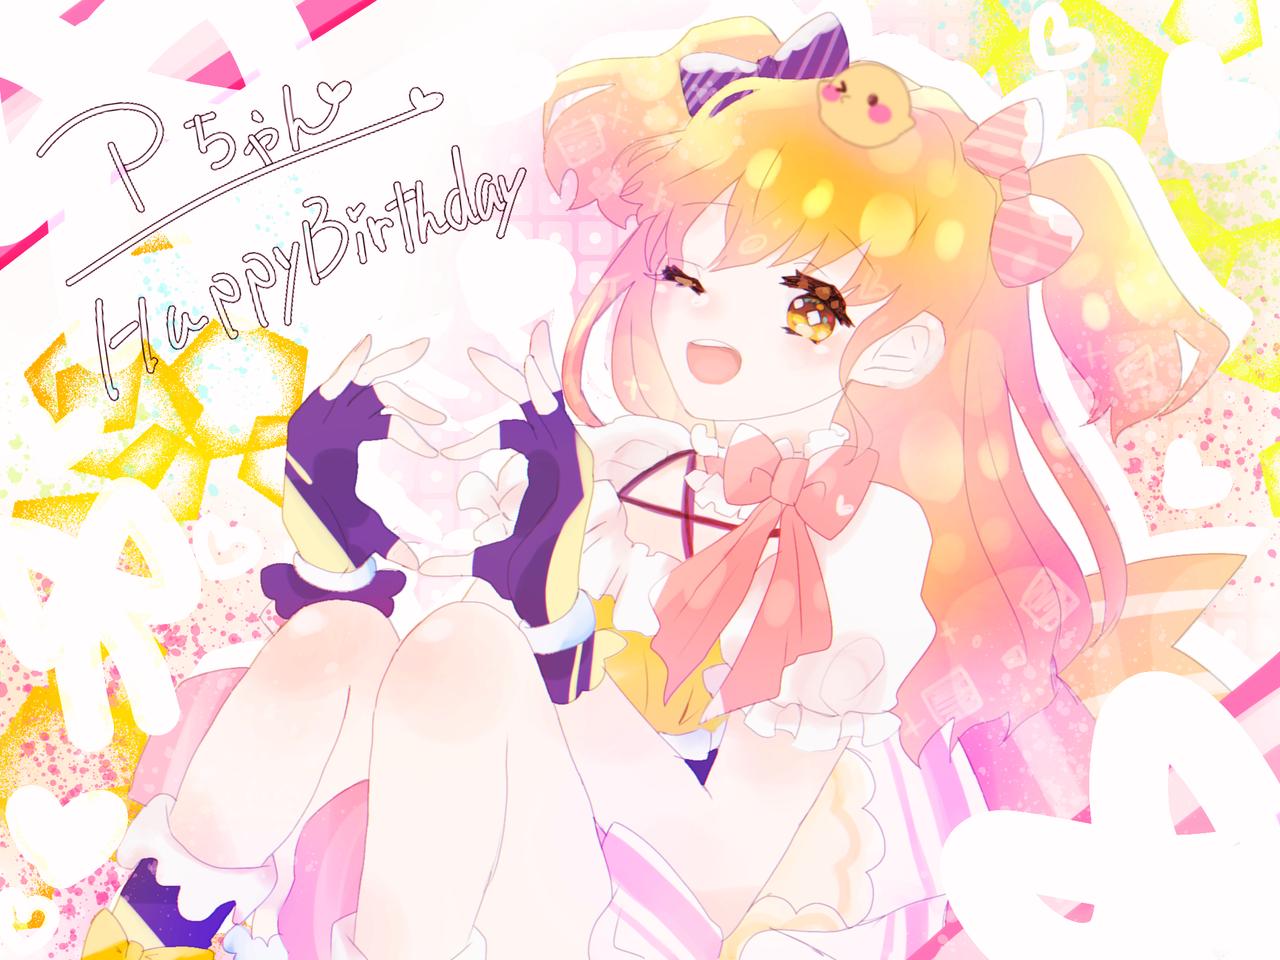 Pちゃん~~~~~ Illust of 陽彩🌼 birthday digital P丸様。 colorful